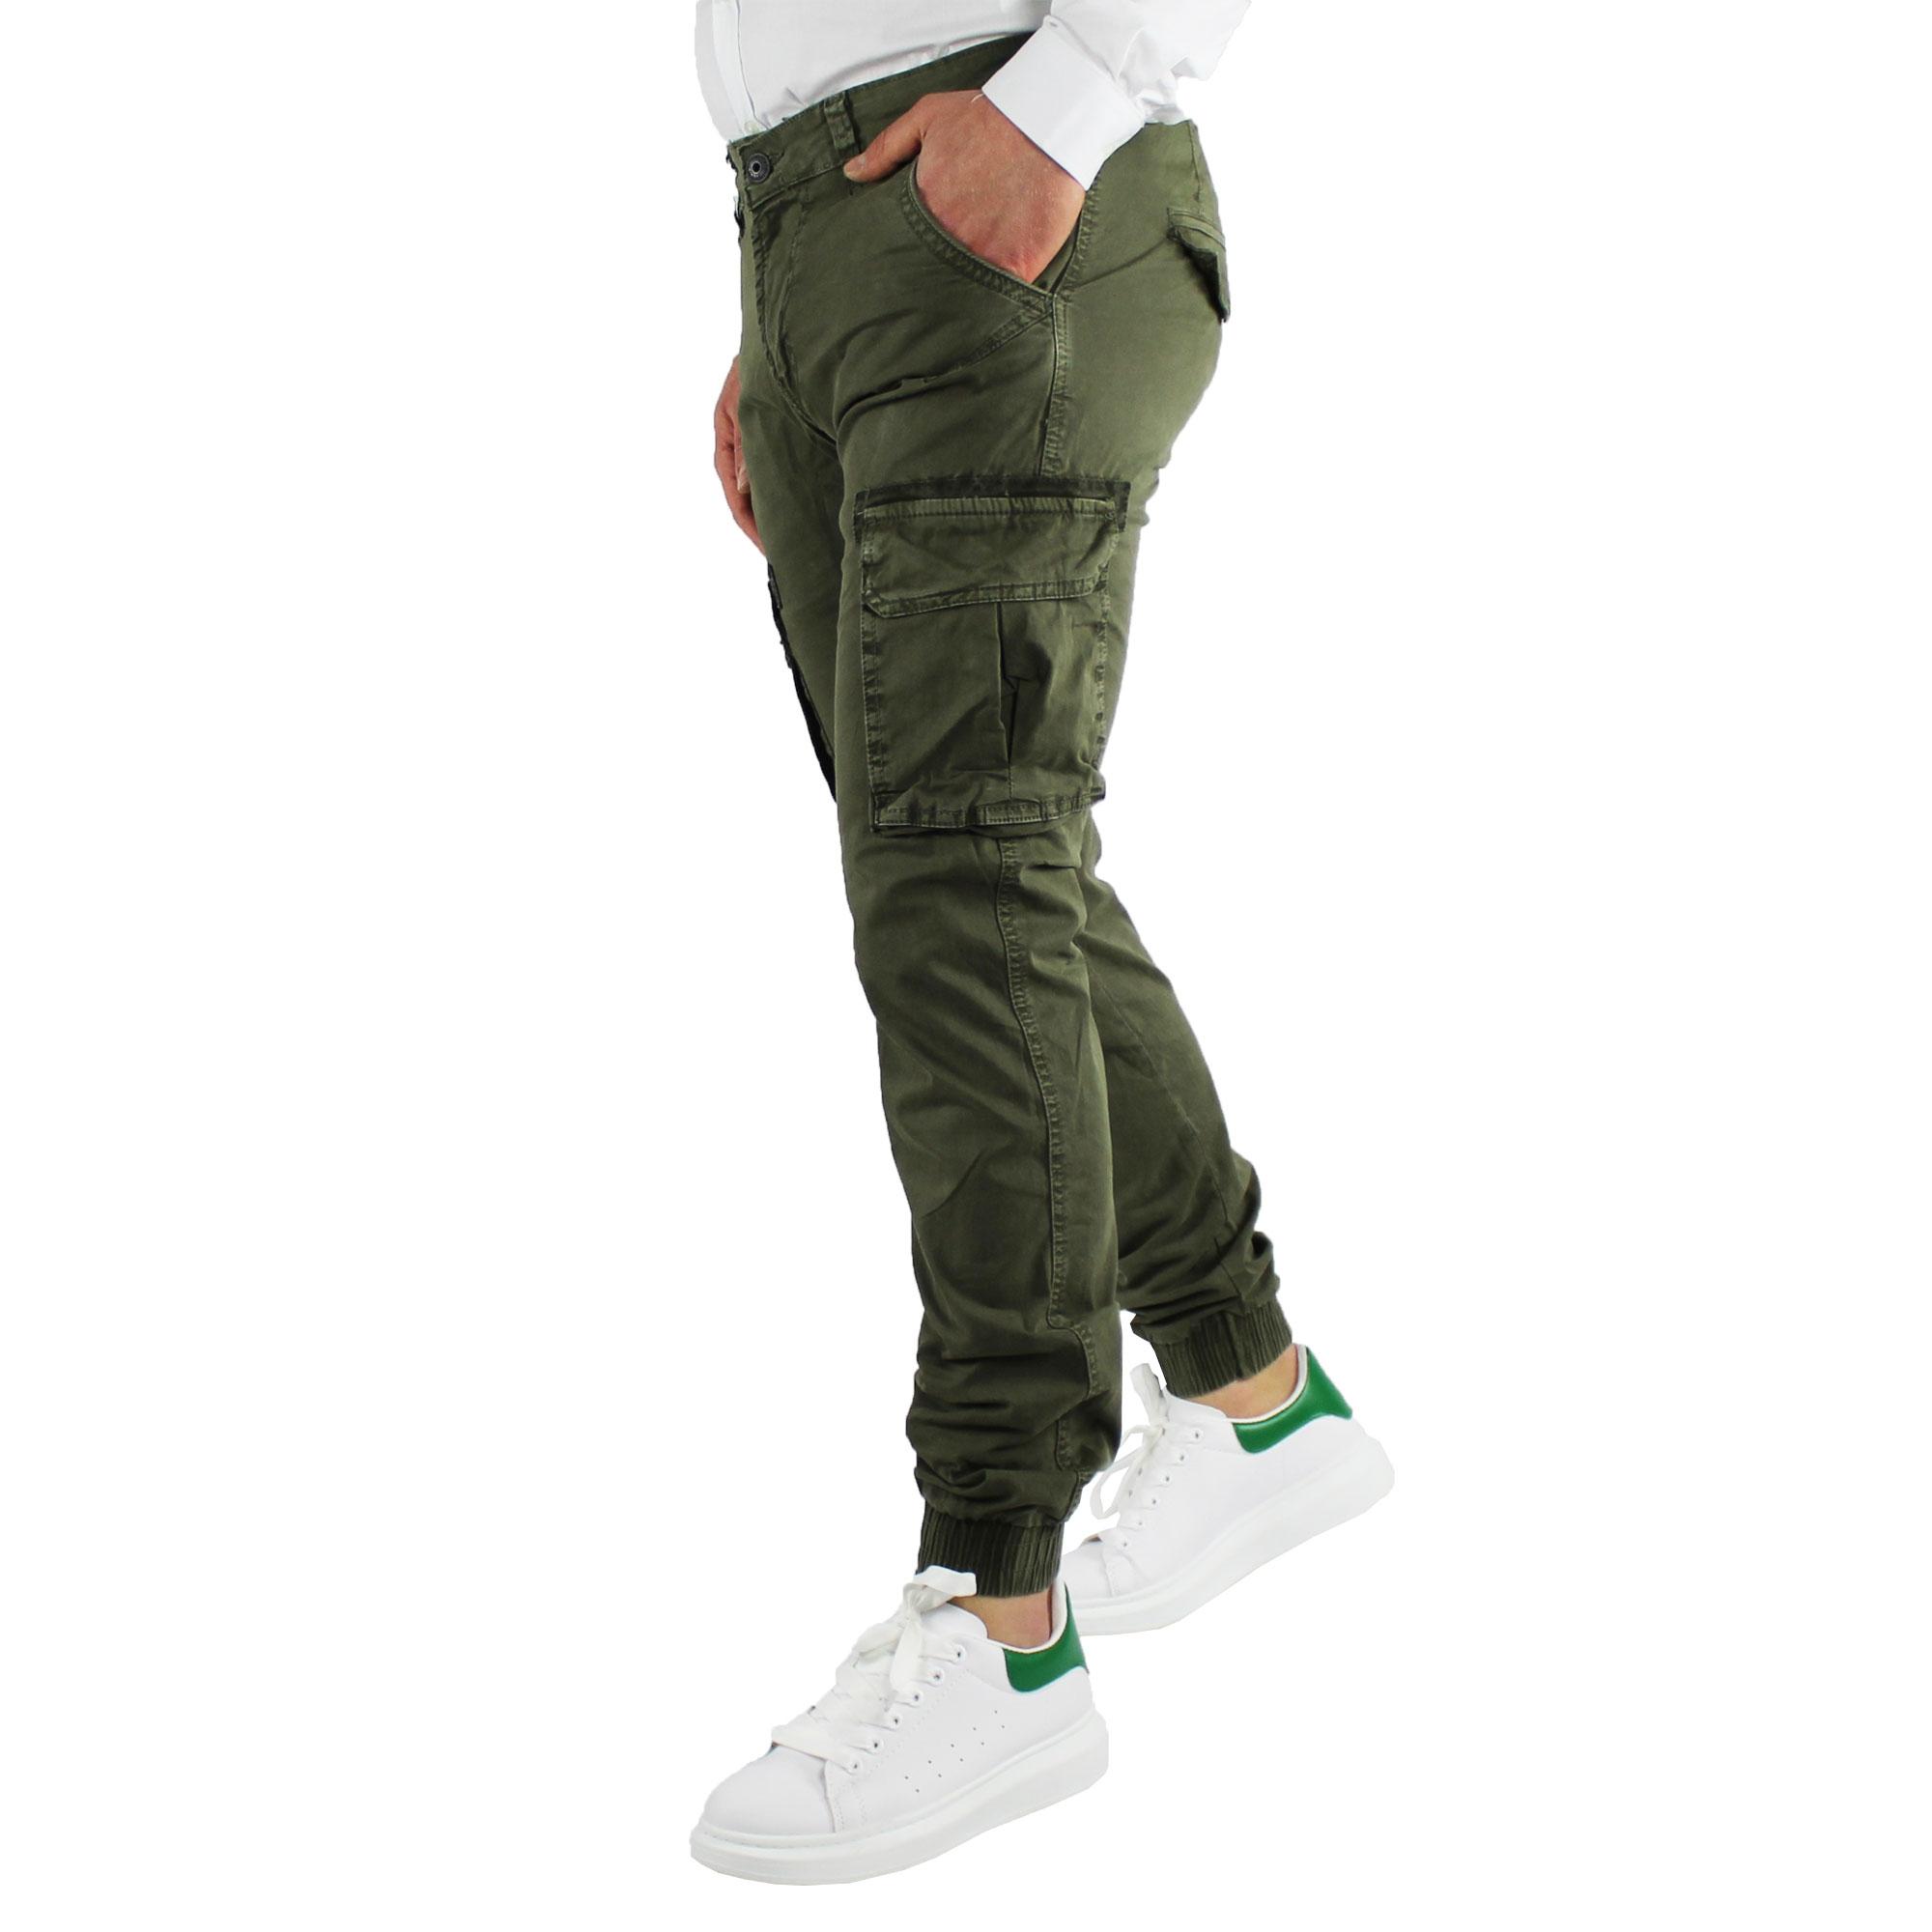 Pantaloni-Uomo-Cargo-Invernali-Pantalone-Tasche-Laterali-SlimFit-Verde-Blu-Fango miniatura 7